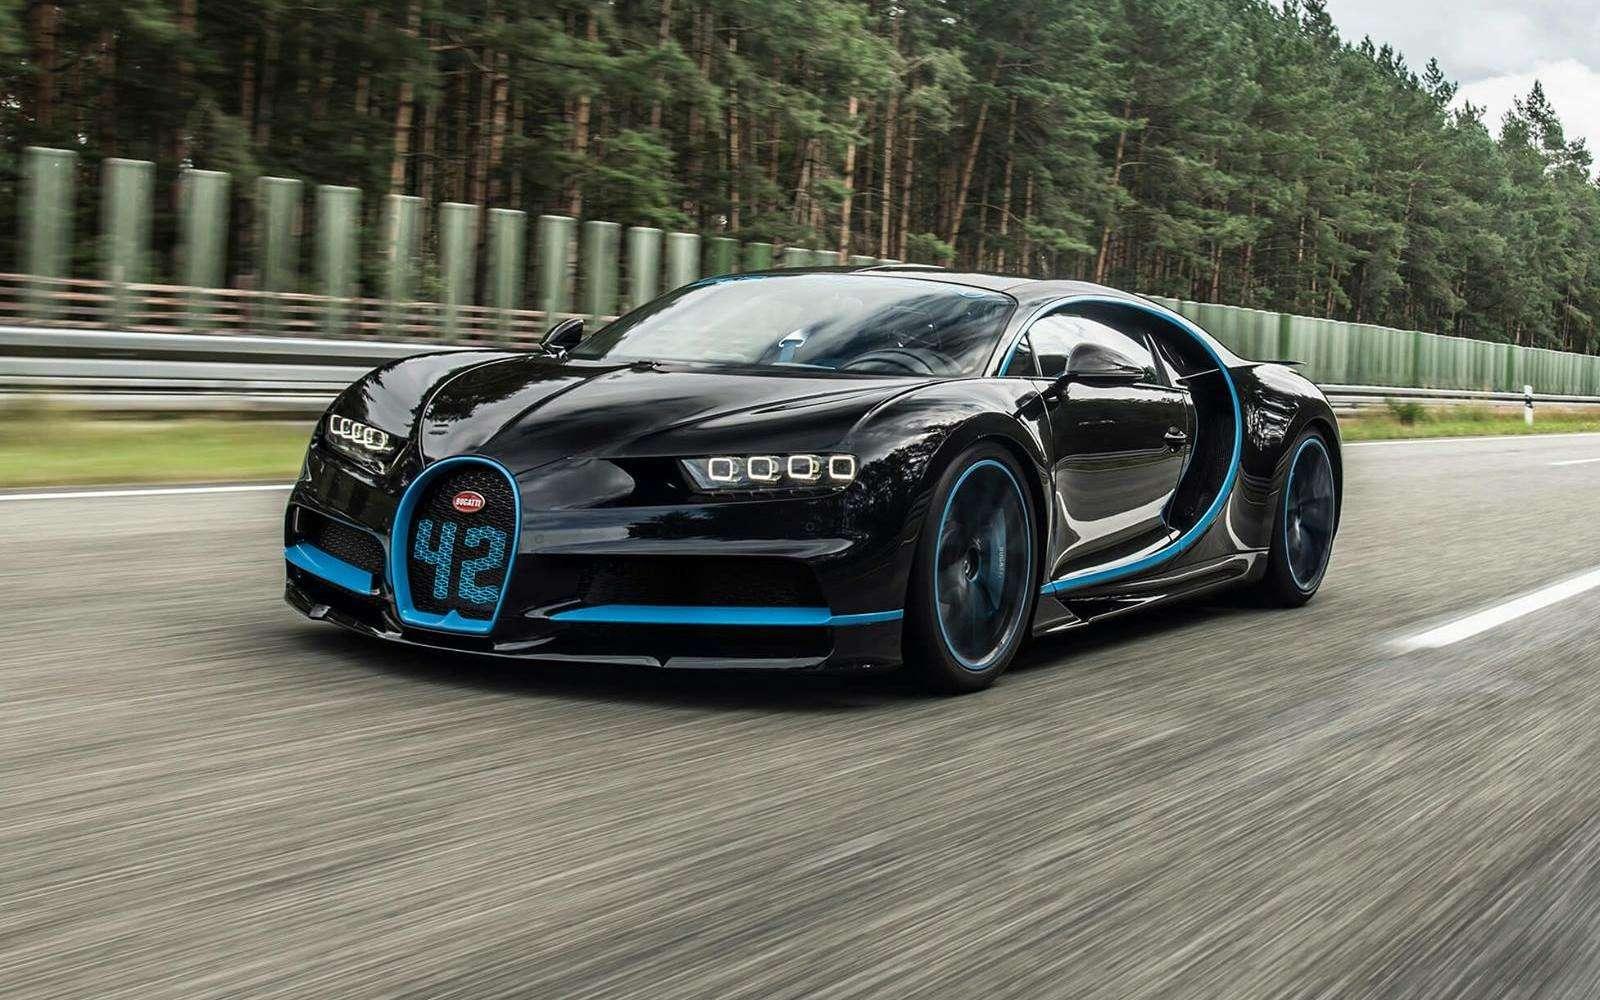 0-400-0 км/ч— видео рекордного заезда Bugatti Chiron— фото 794897